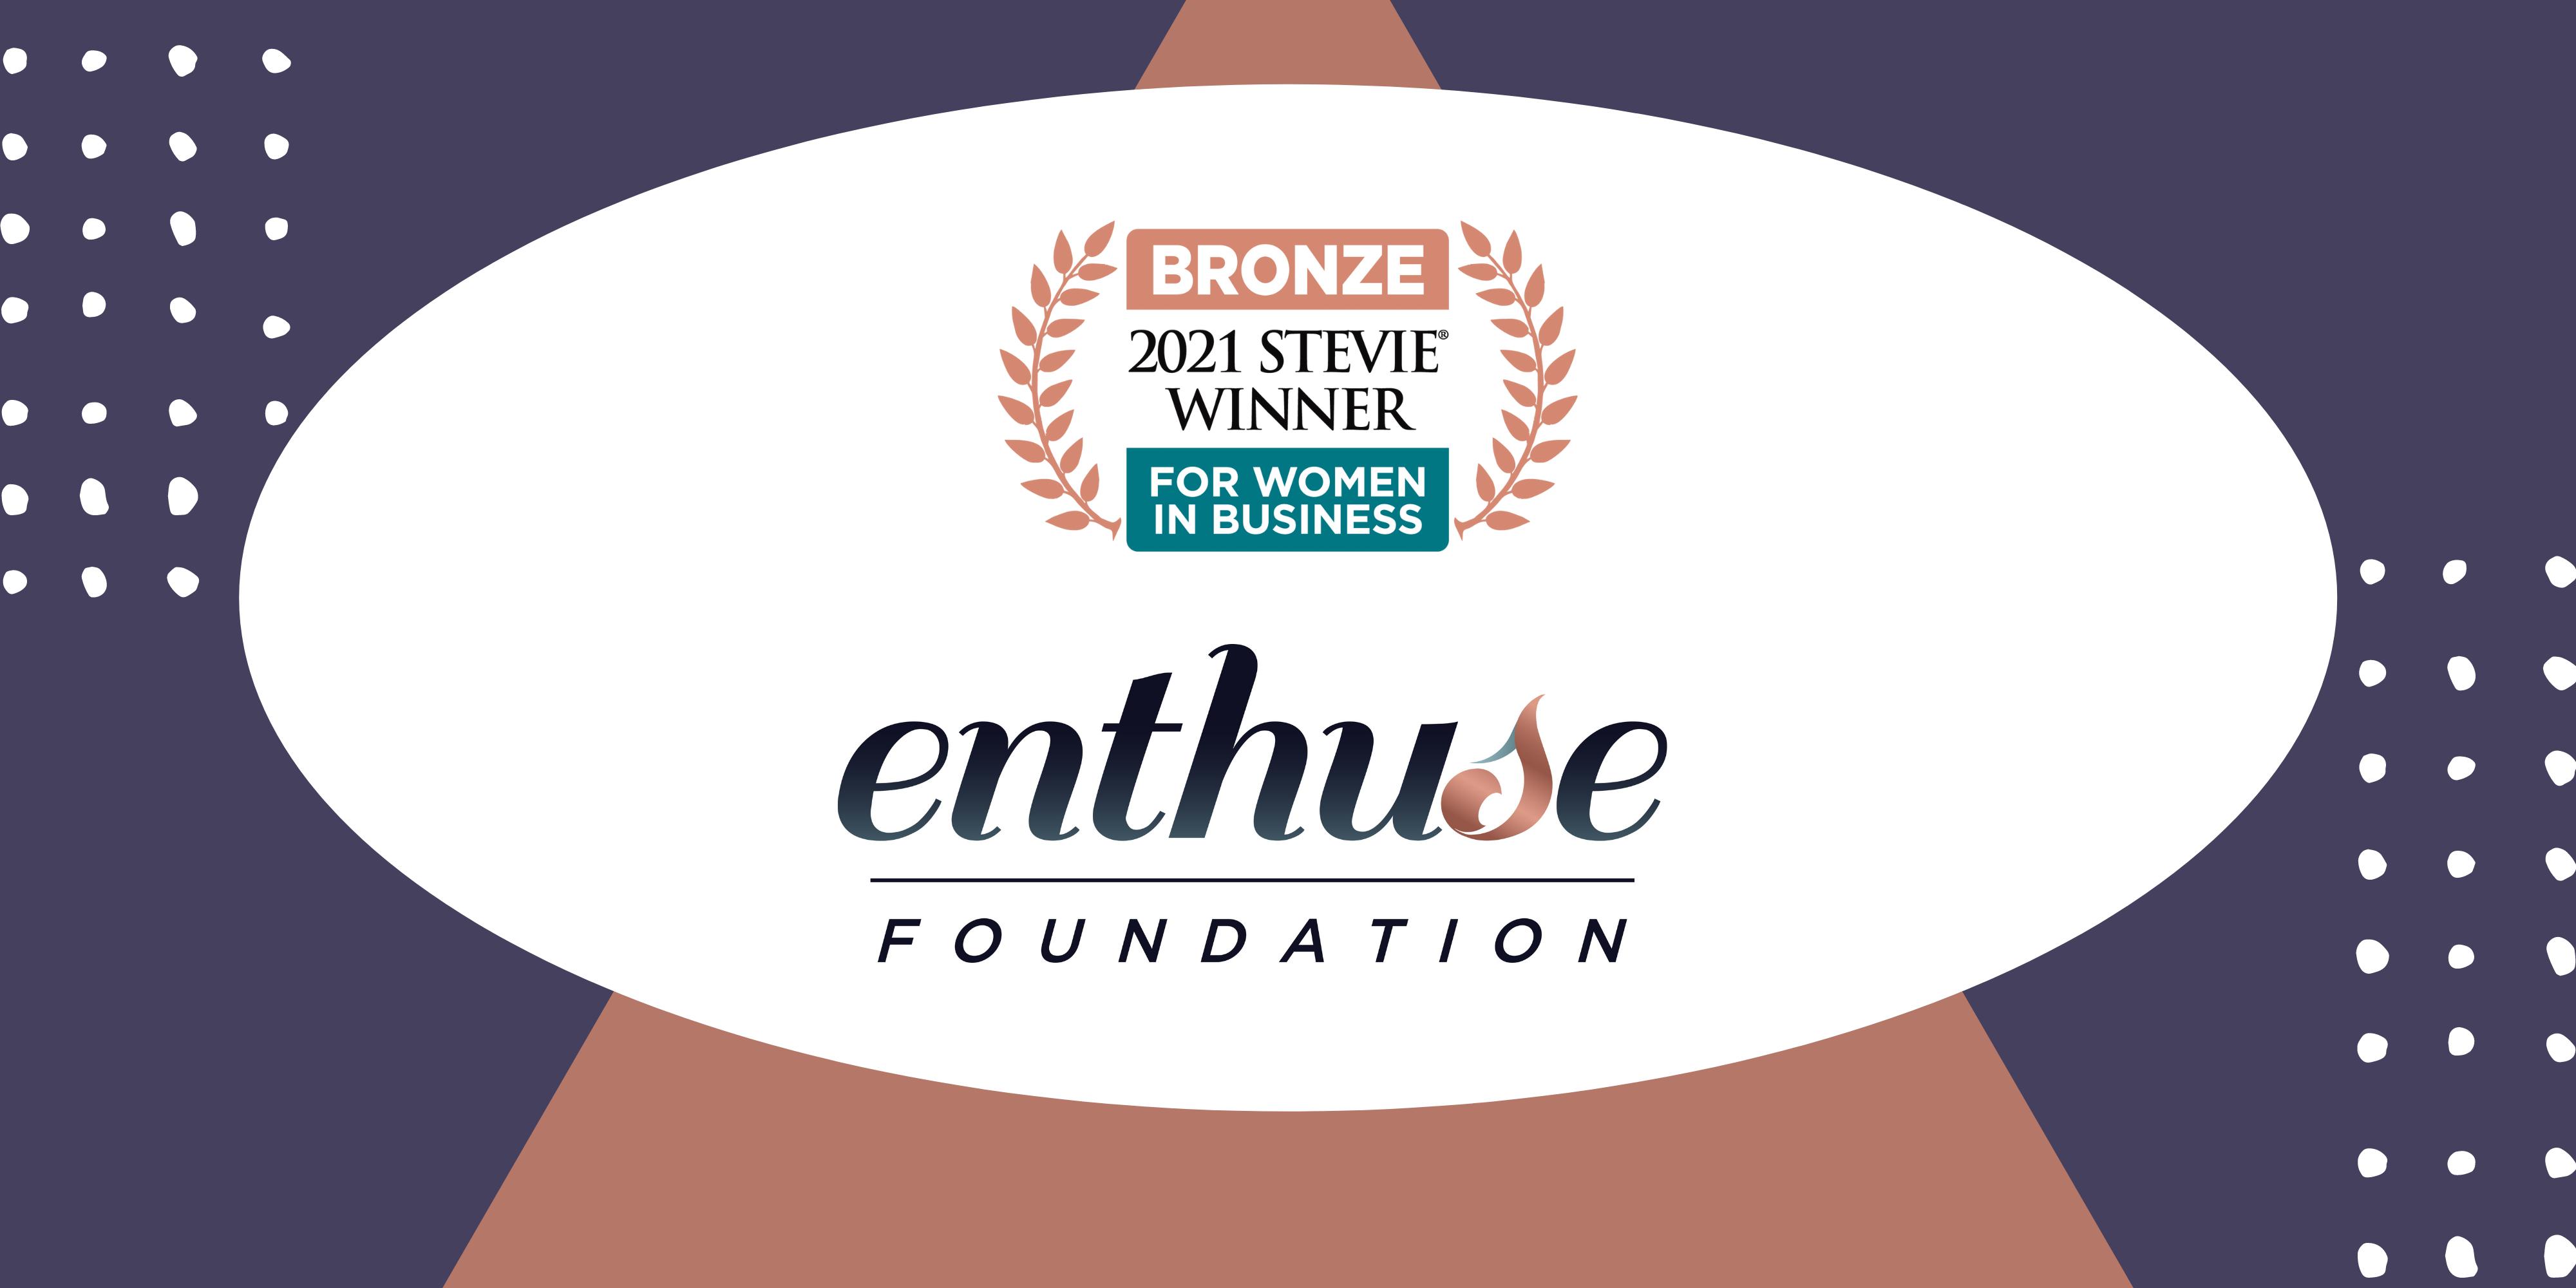 Enthuse Foundation Wins Bronze Stevie® Award in 2021 Stevie Awards for Women in Business